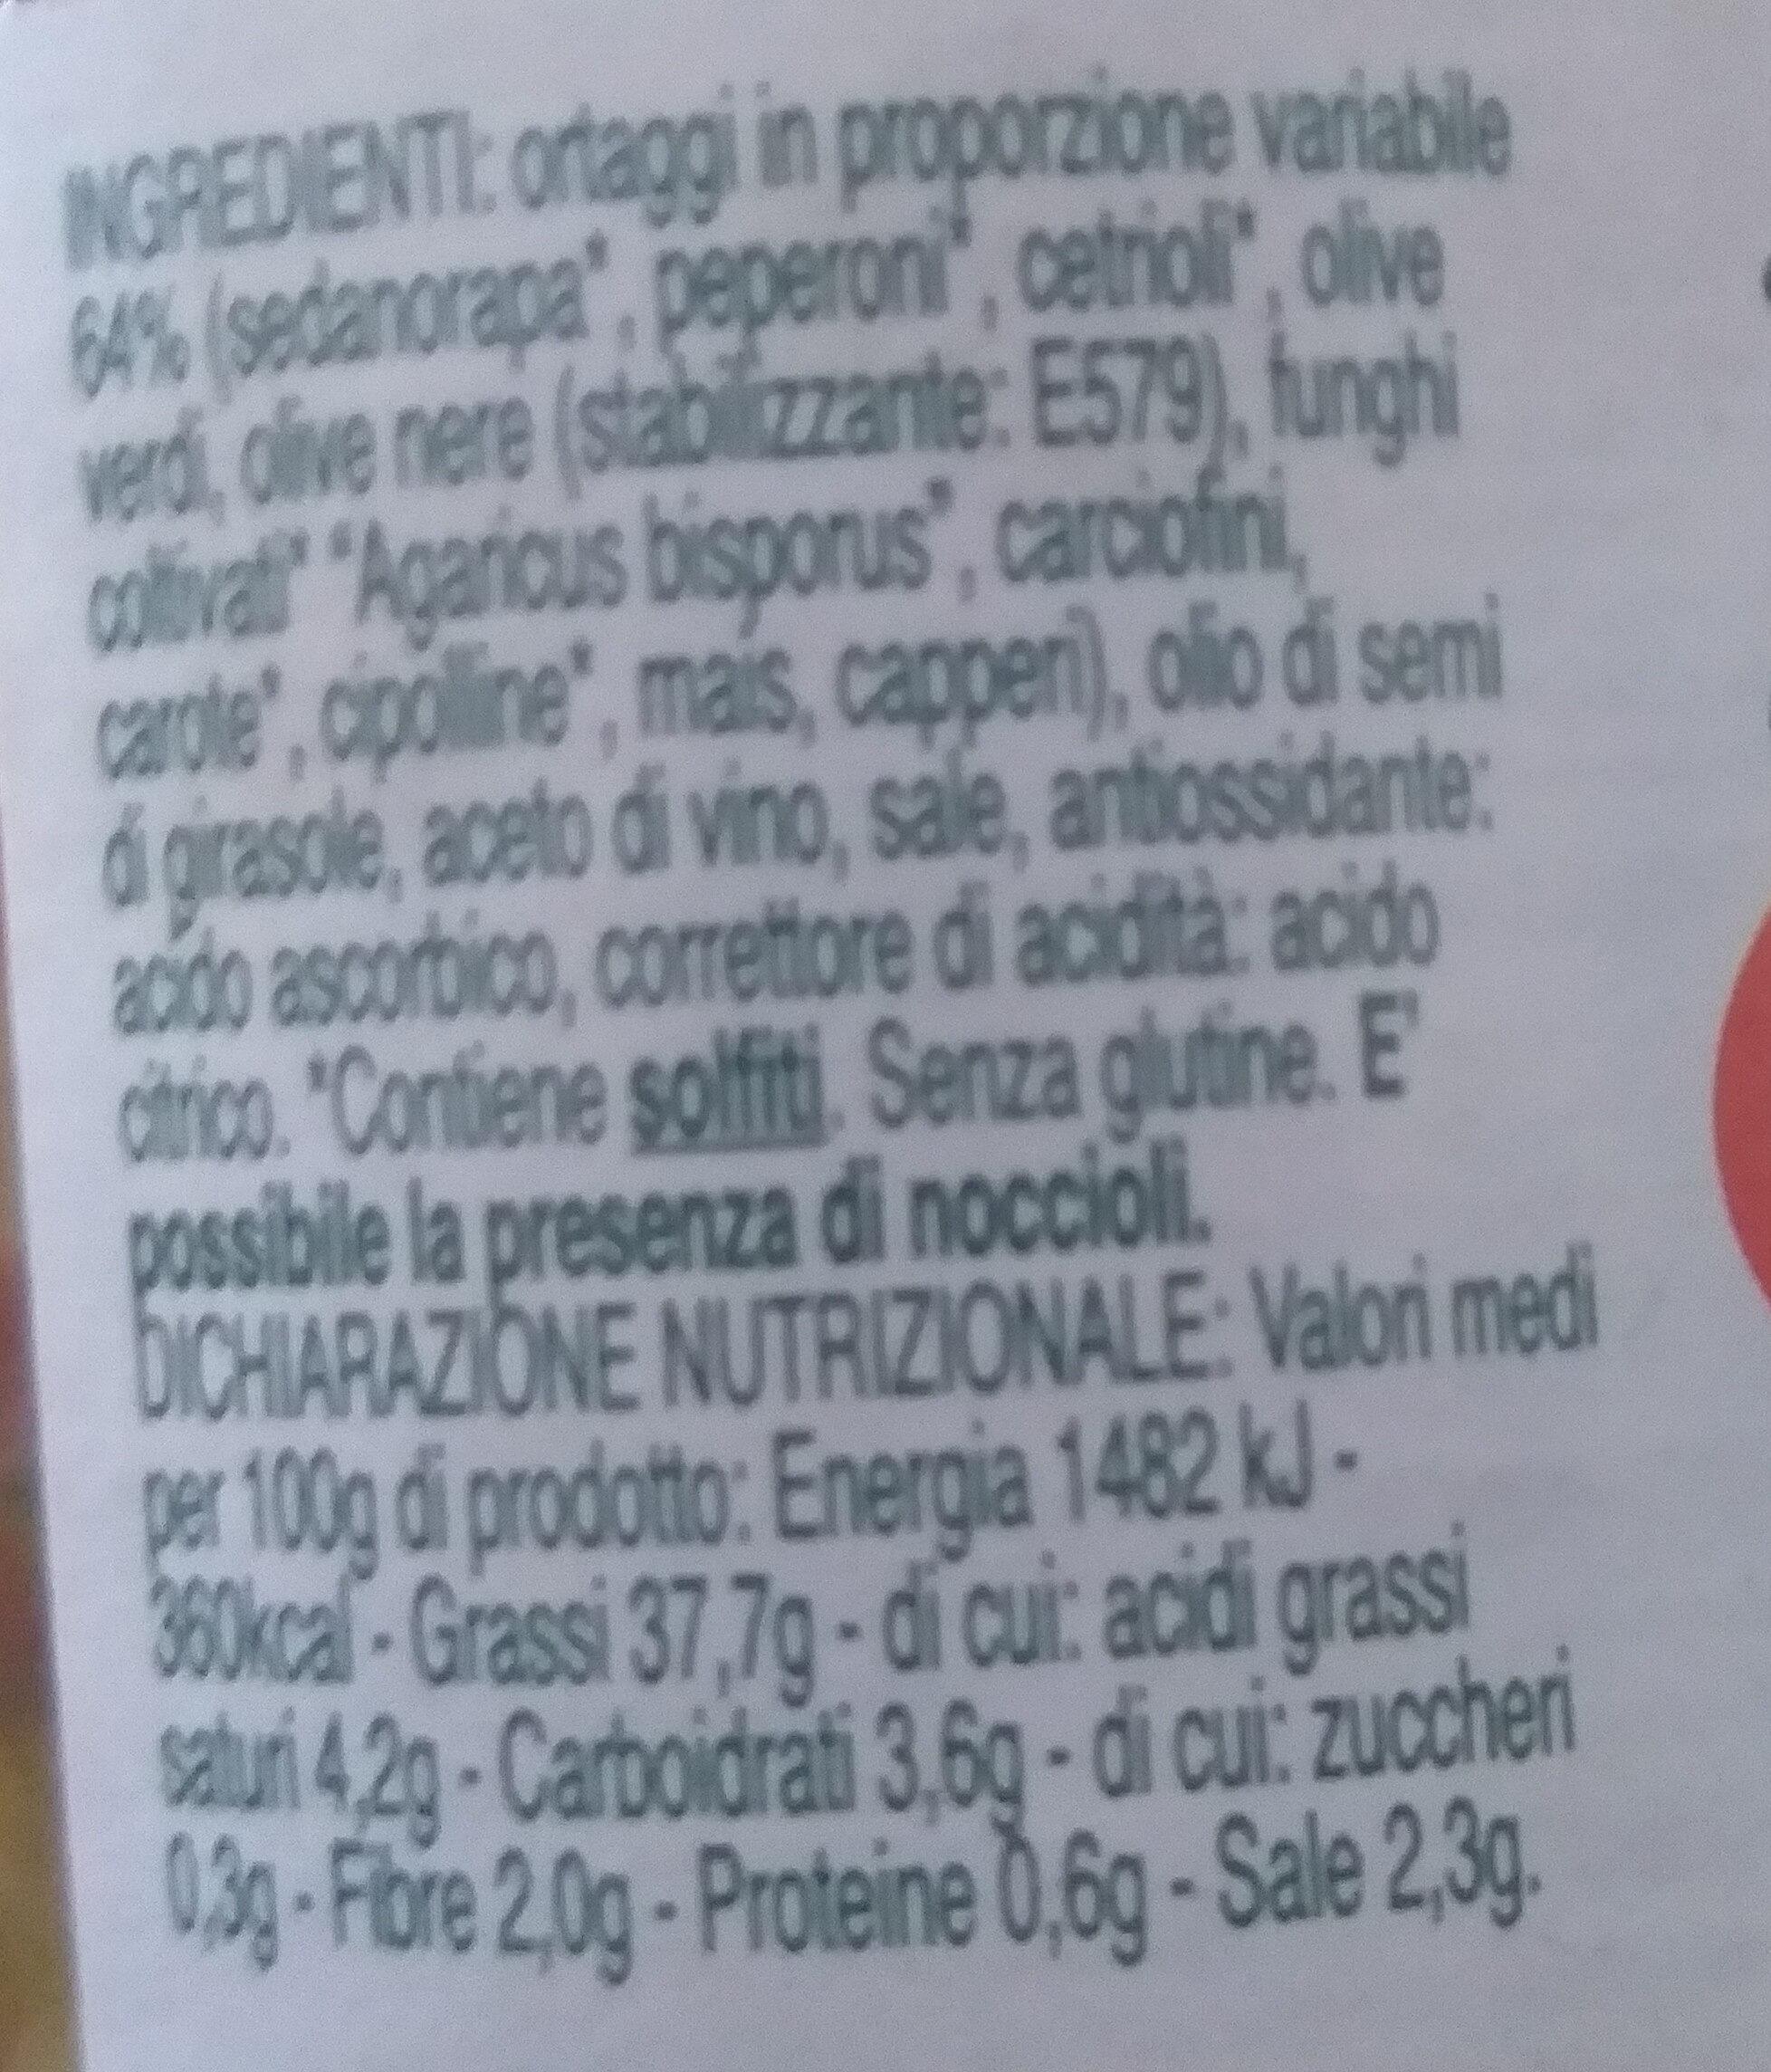 Le Magie dell'Orto RISO MIO - Ingrédients - it